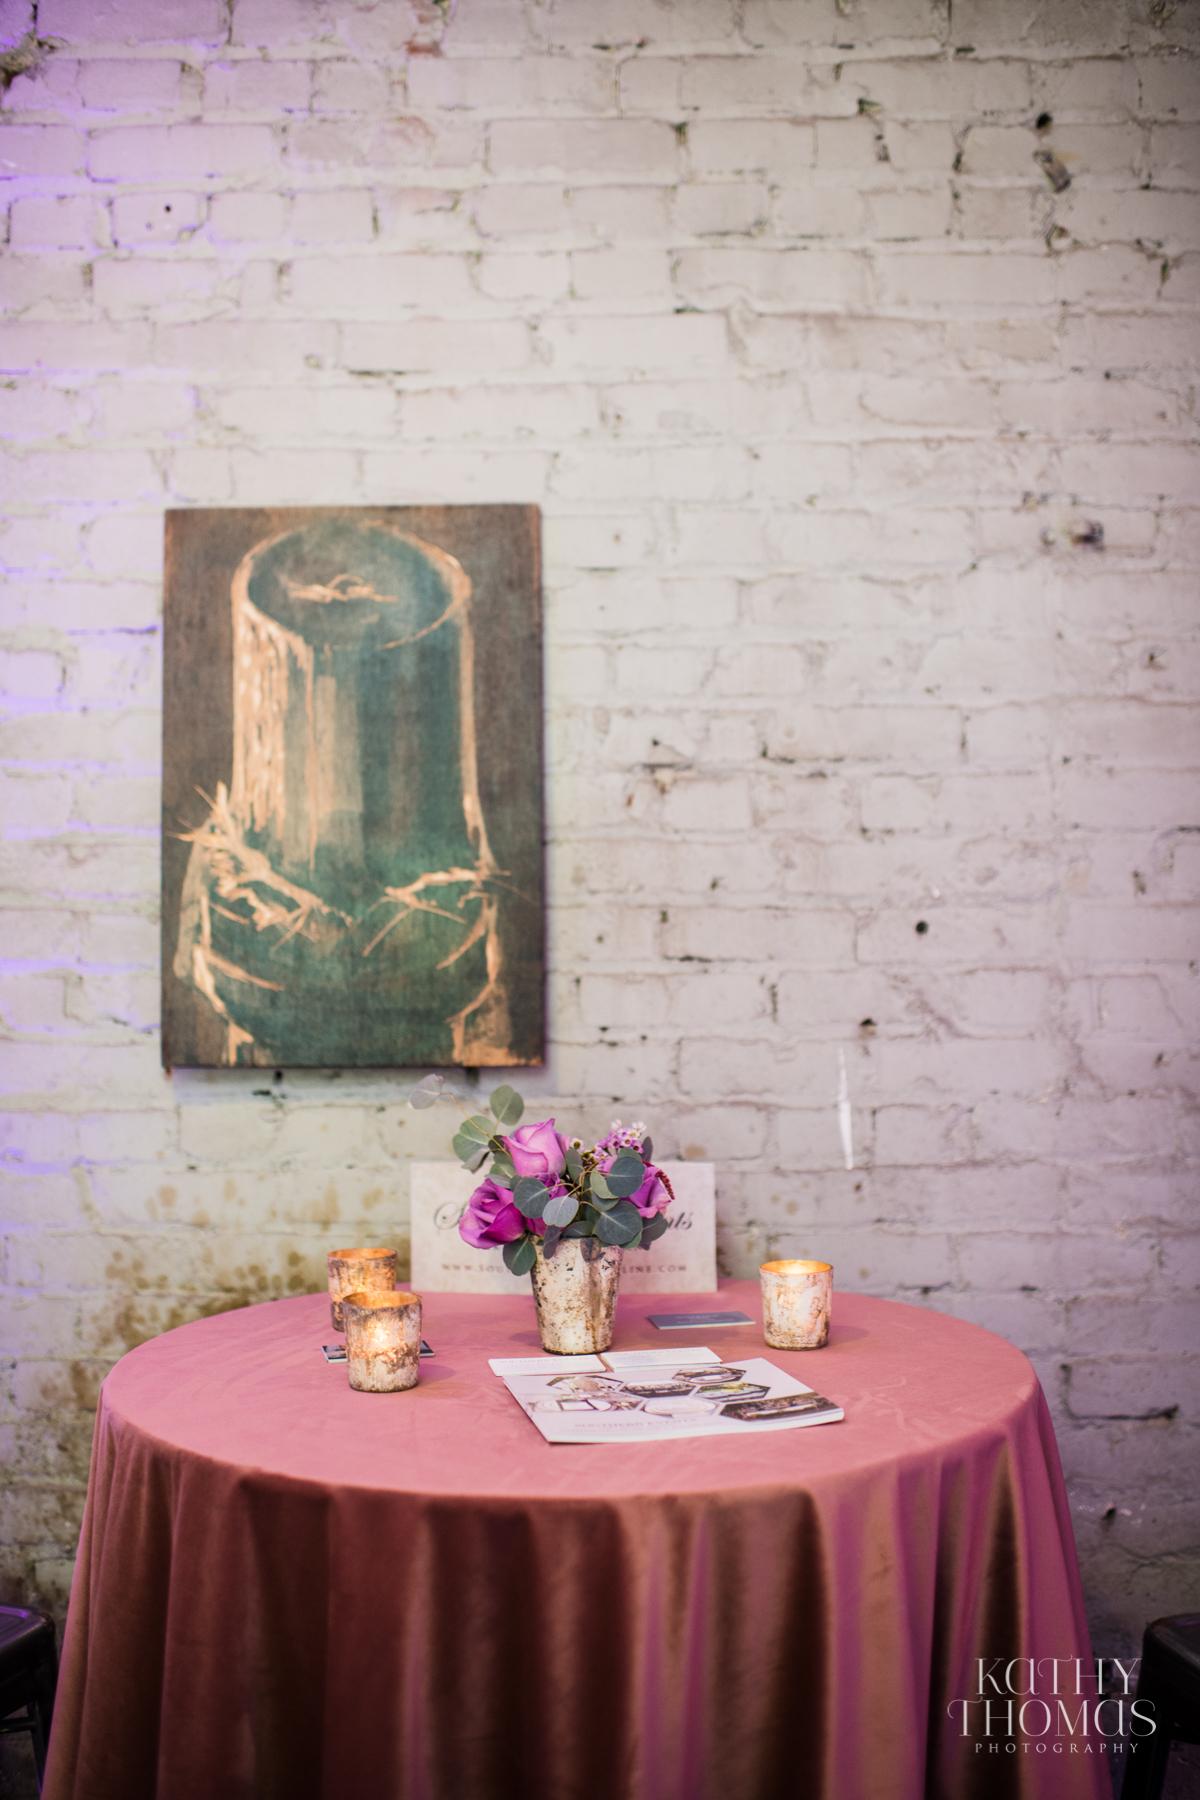 Nashville_Weddings_Kathy_Thomas_Photography-1726.jpg